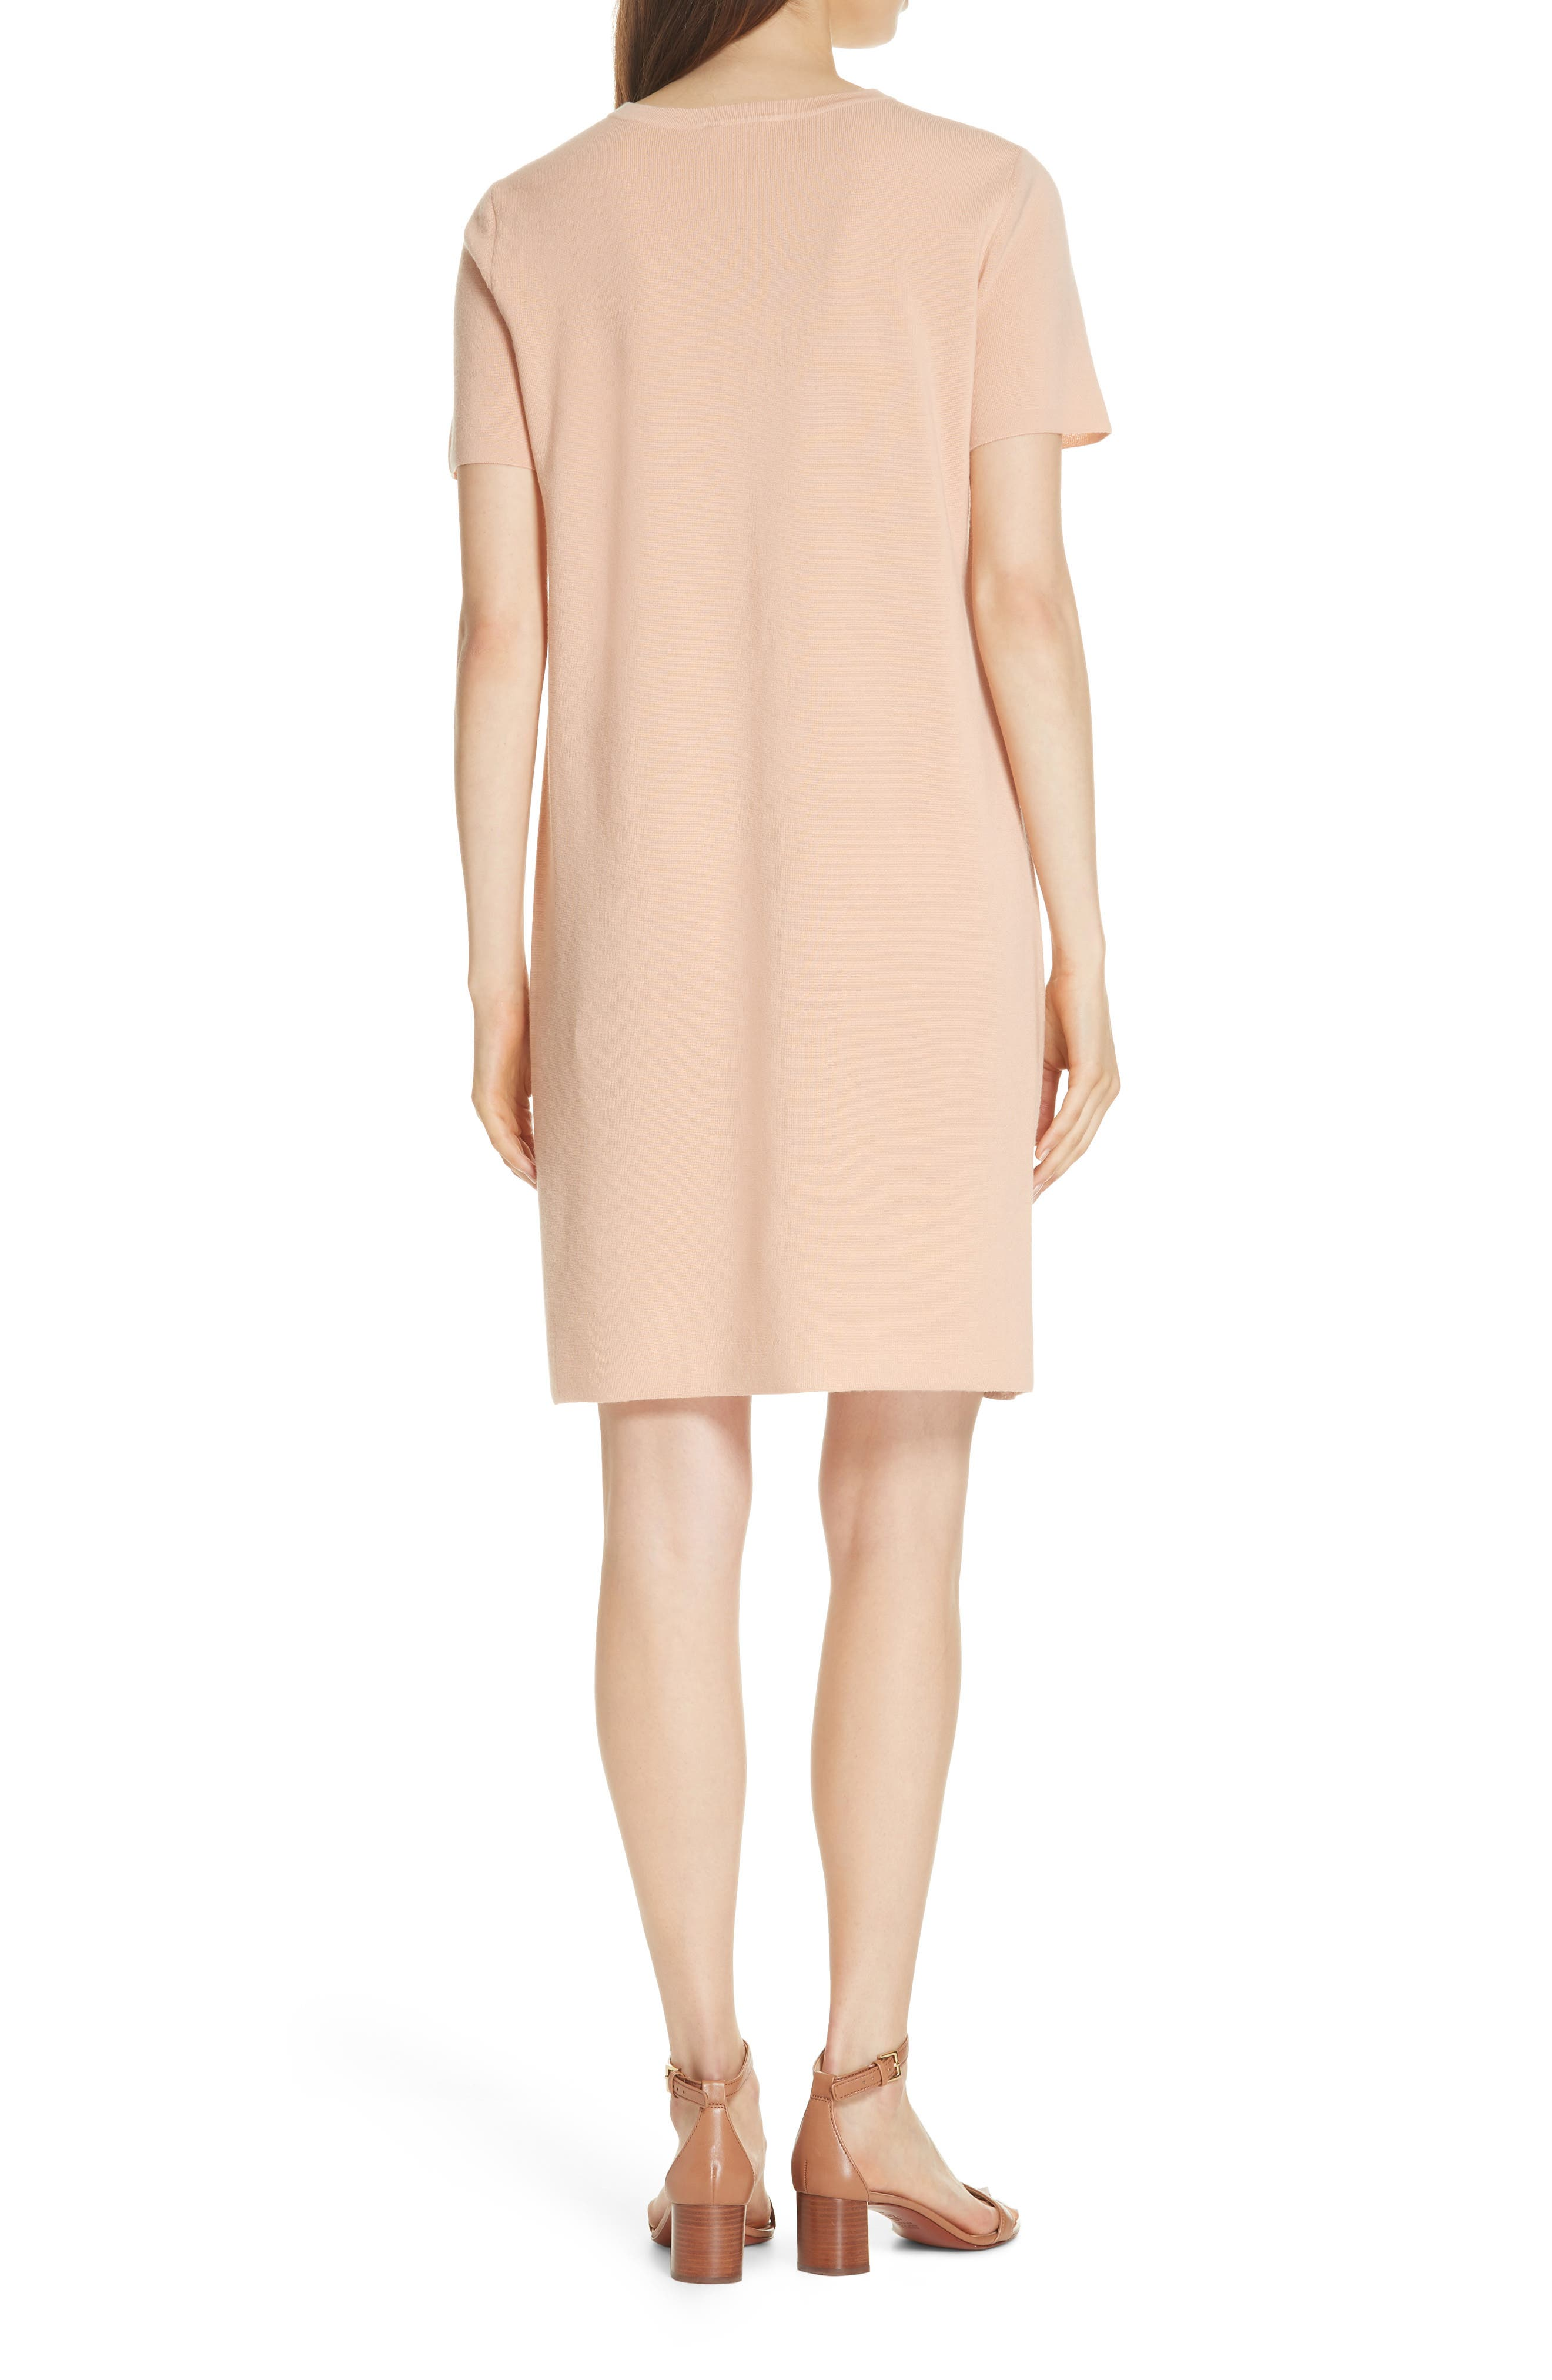 Jonah Jacquard Front Sweater Dress,                             Alternate thumbnail 2, color,                             ALABASTER